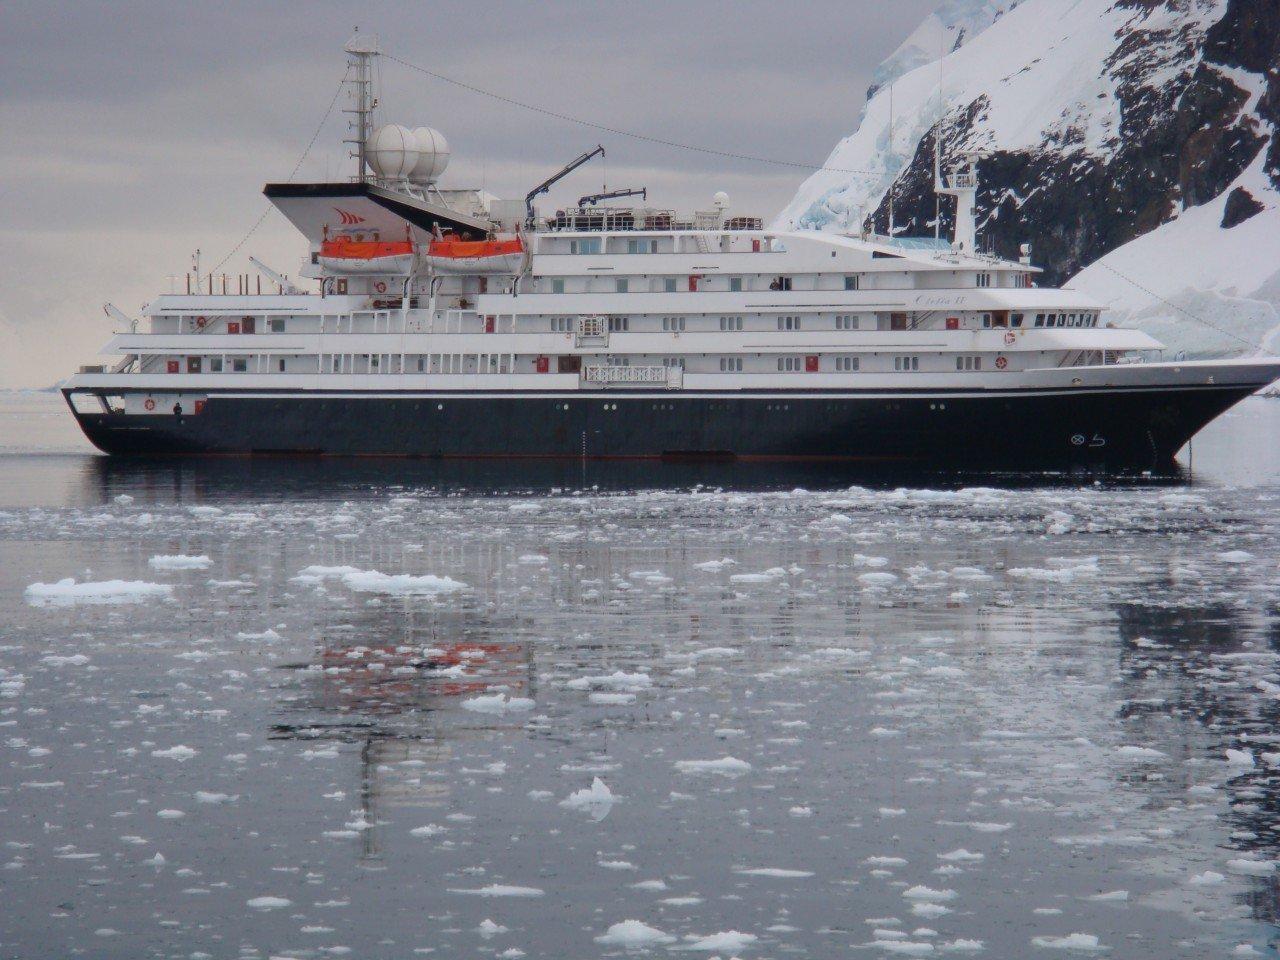 Круизный лайнер Clelia II